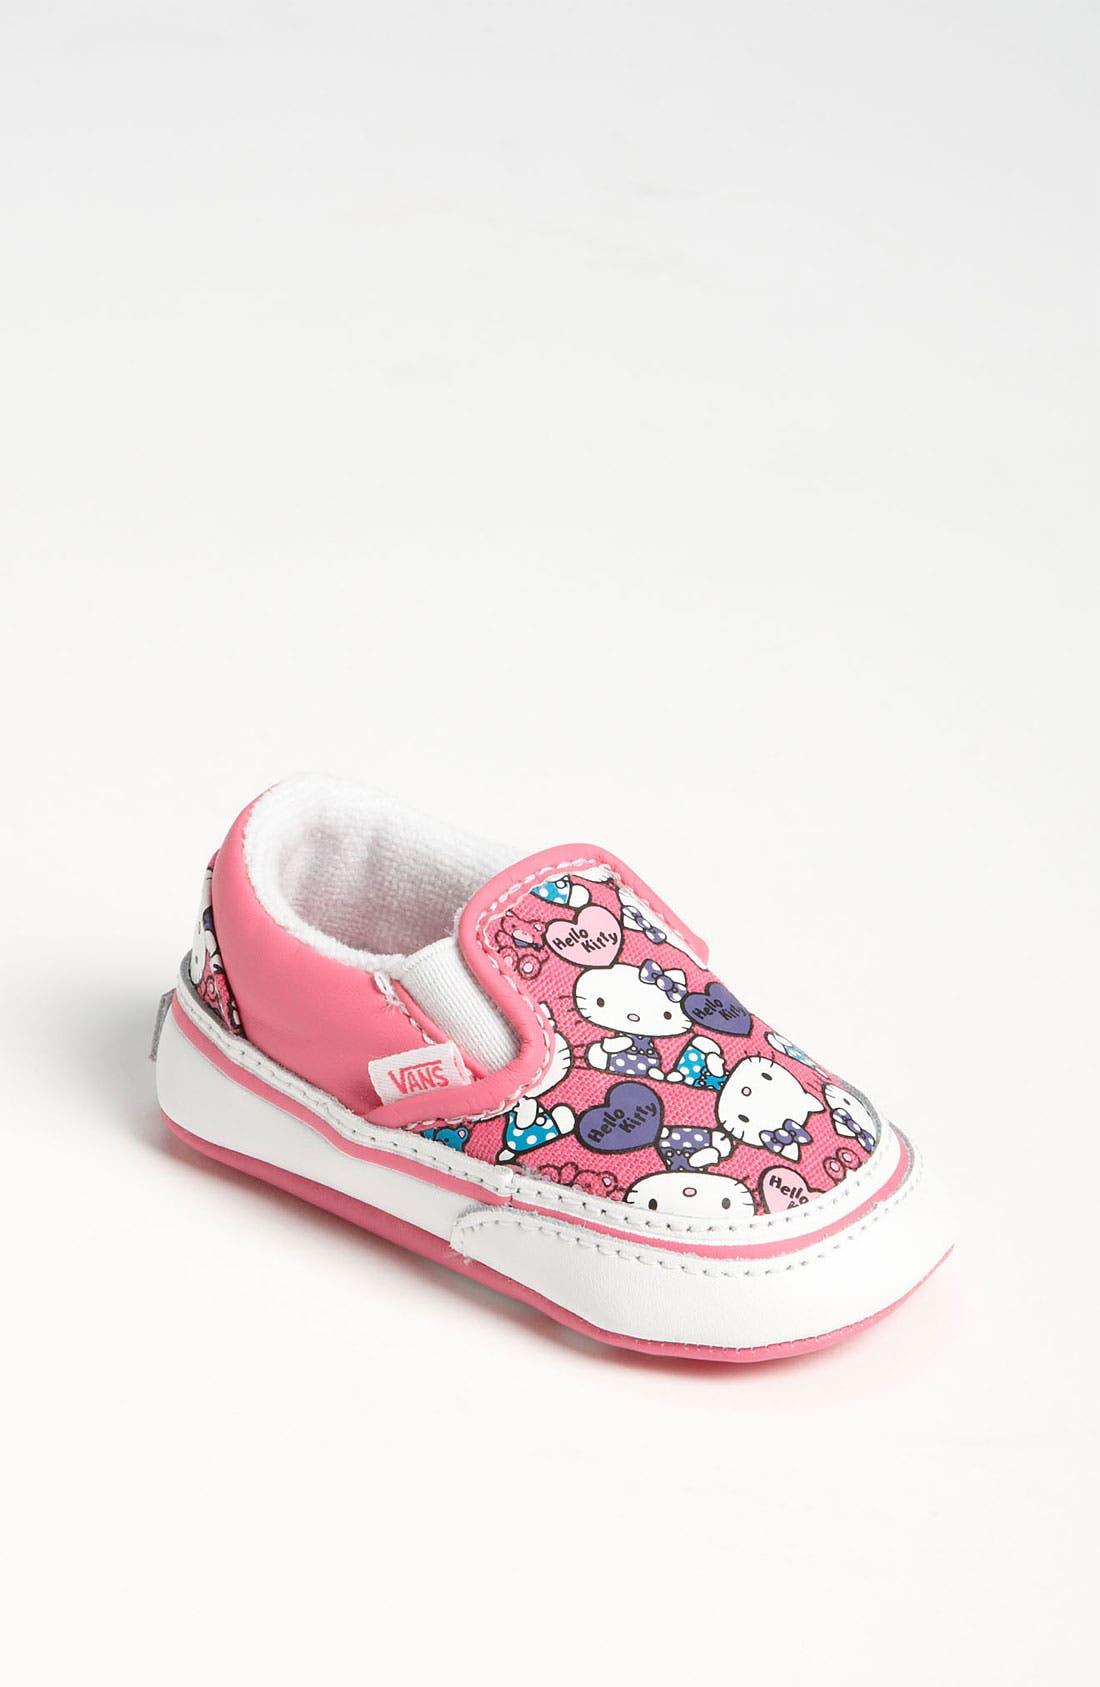 Main Image - Vans 'Classic - Hello Kitty®' Crib Shoe (Infant)